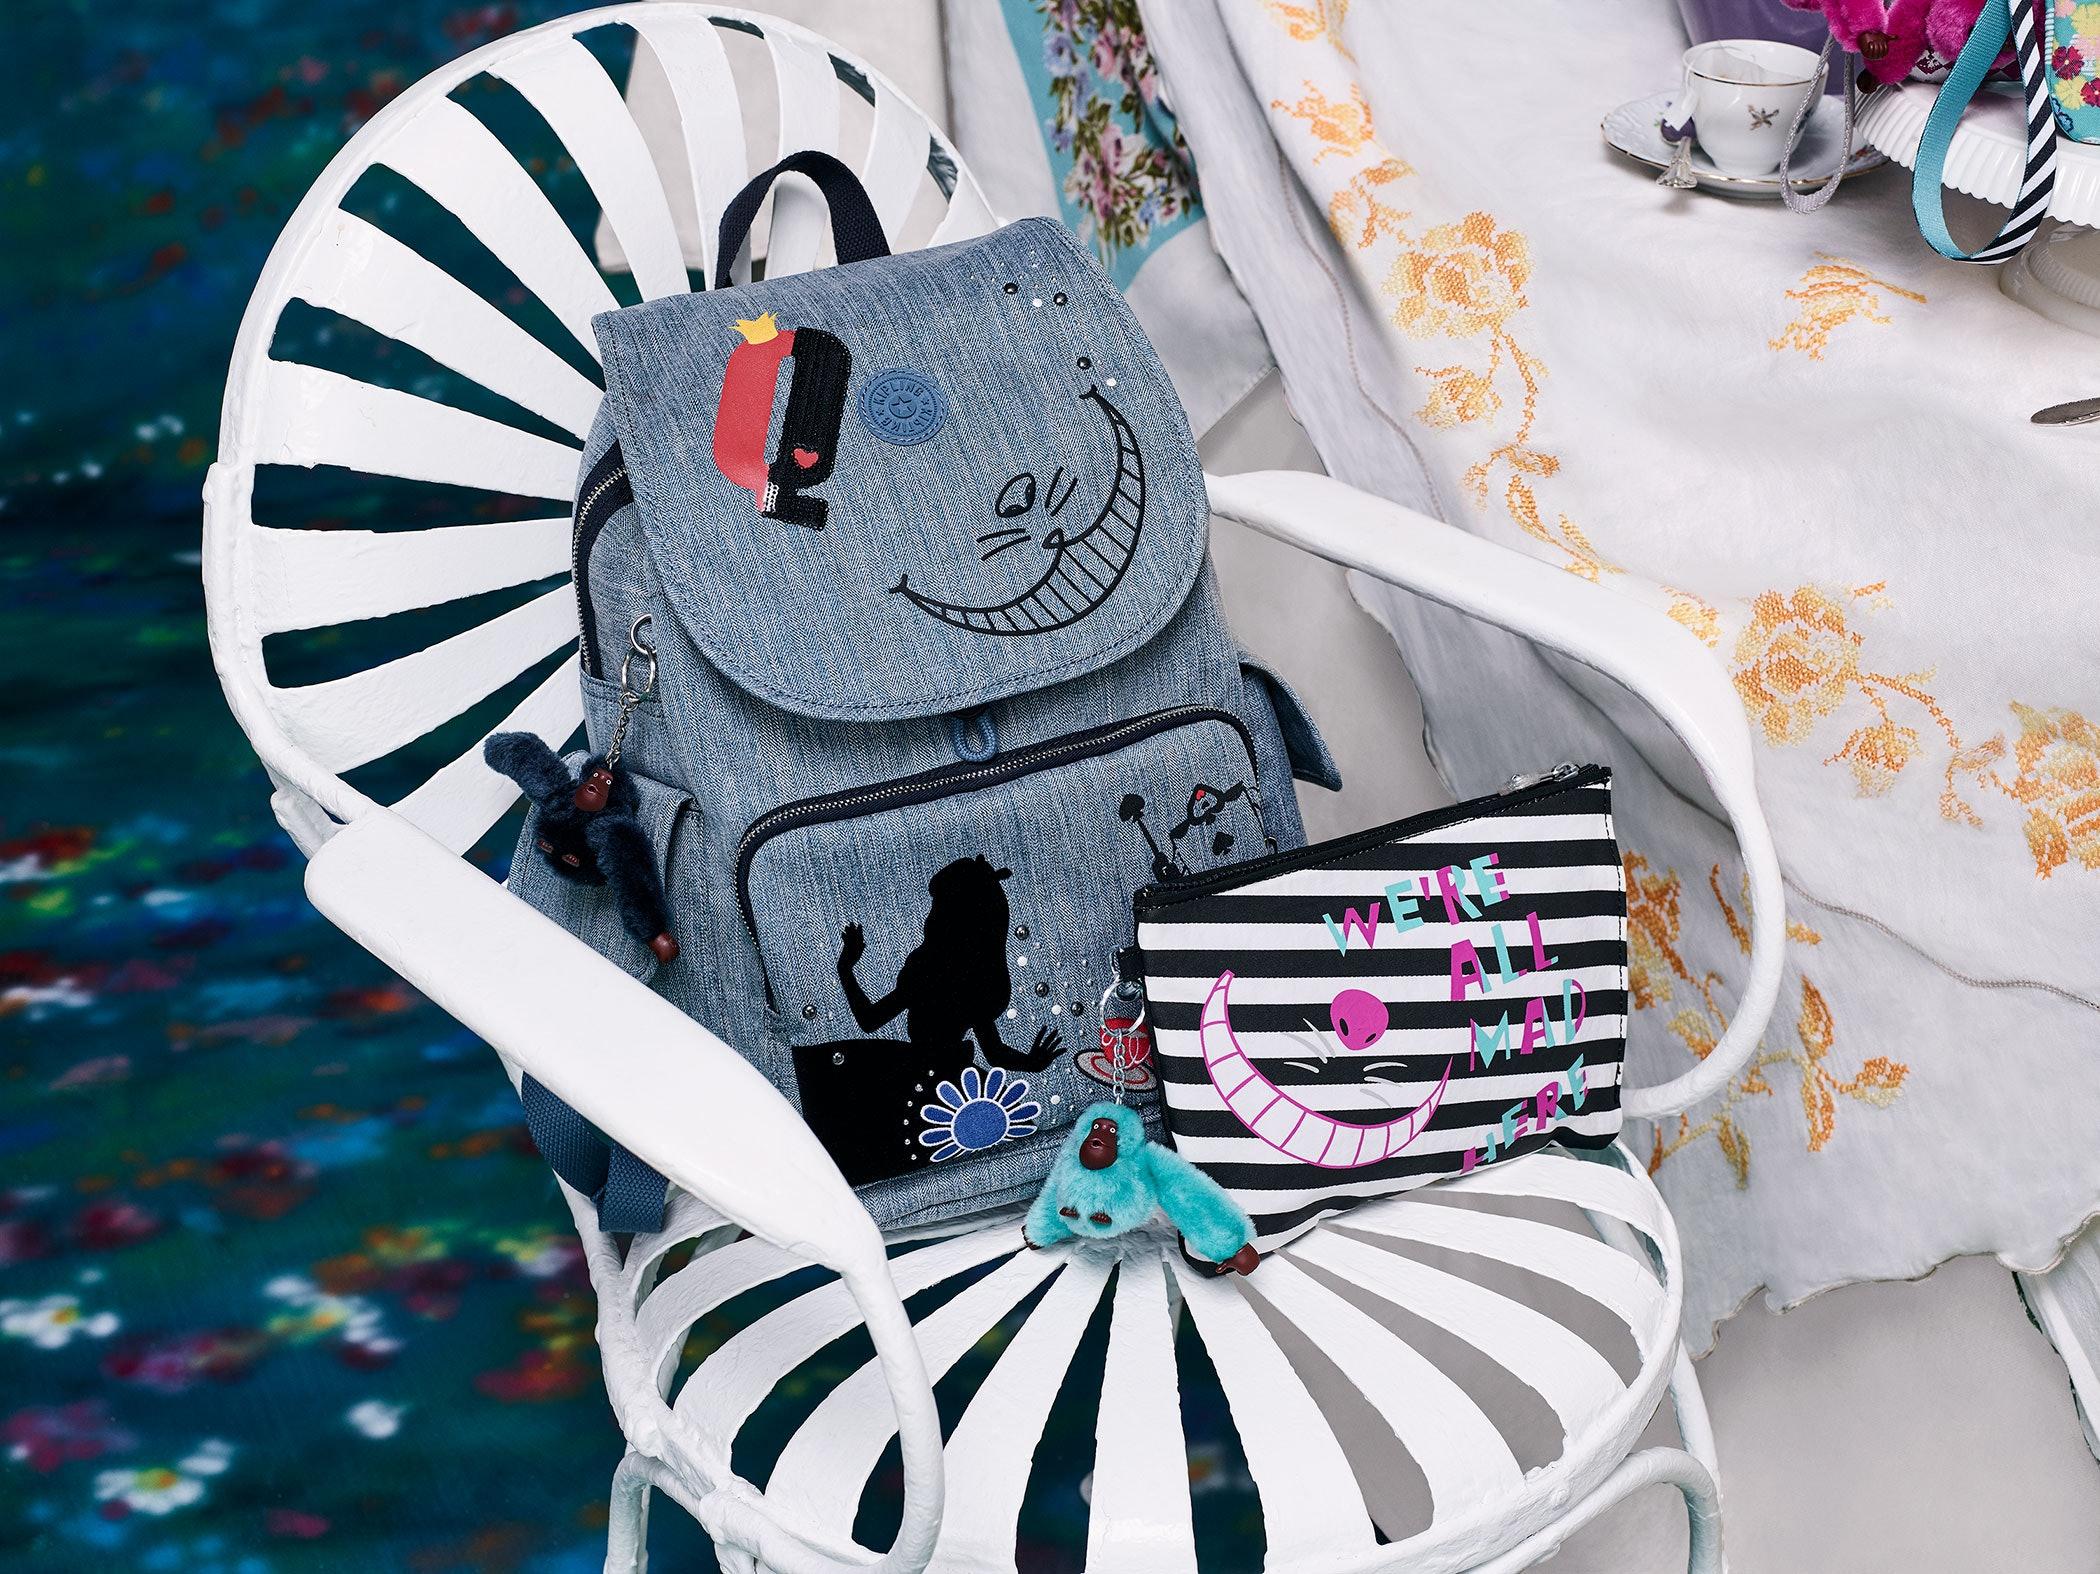 18050ed6df3 7799 KIPLING X DISNEY Alice In The Wonderland Ellettronico Pouch BLACK